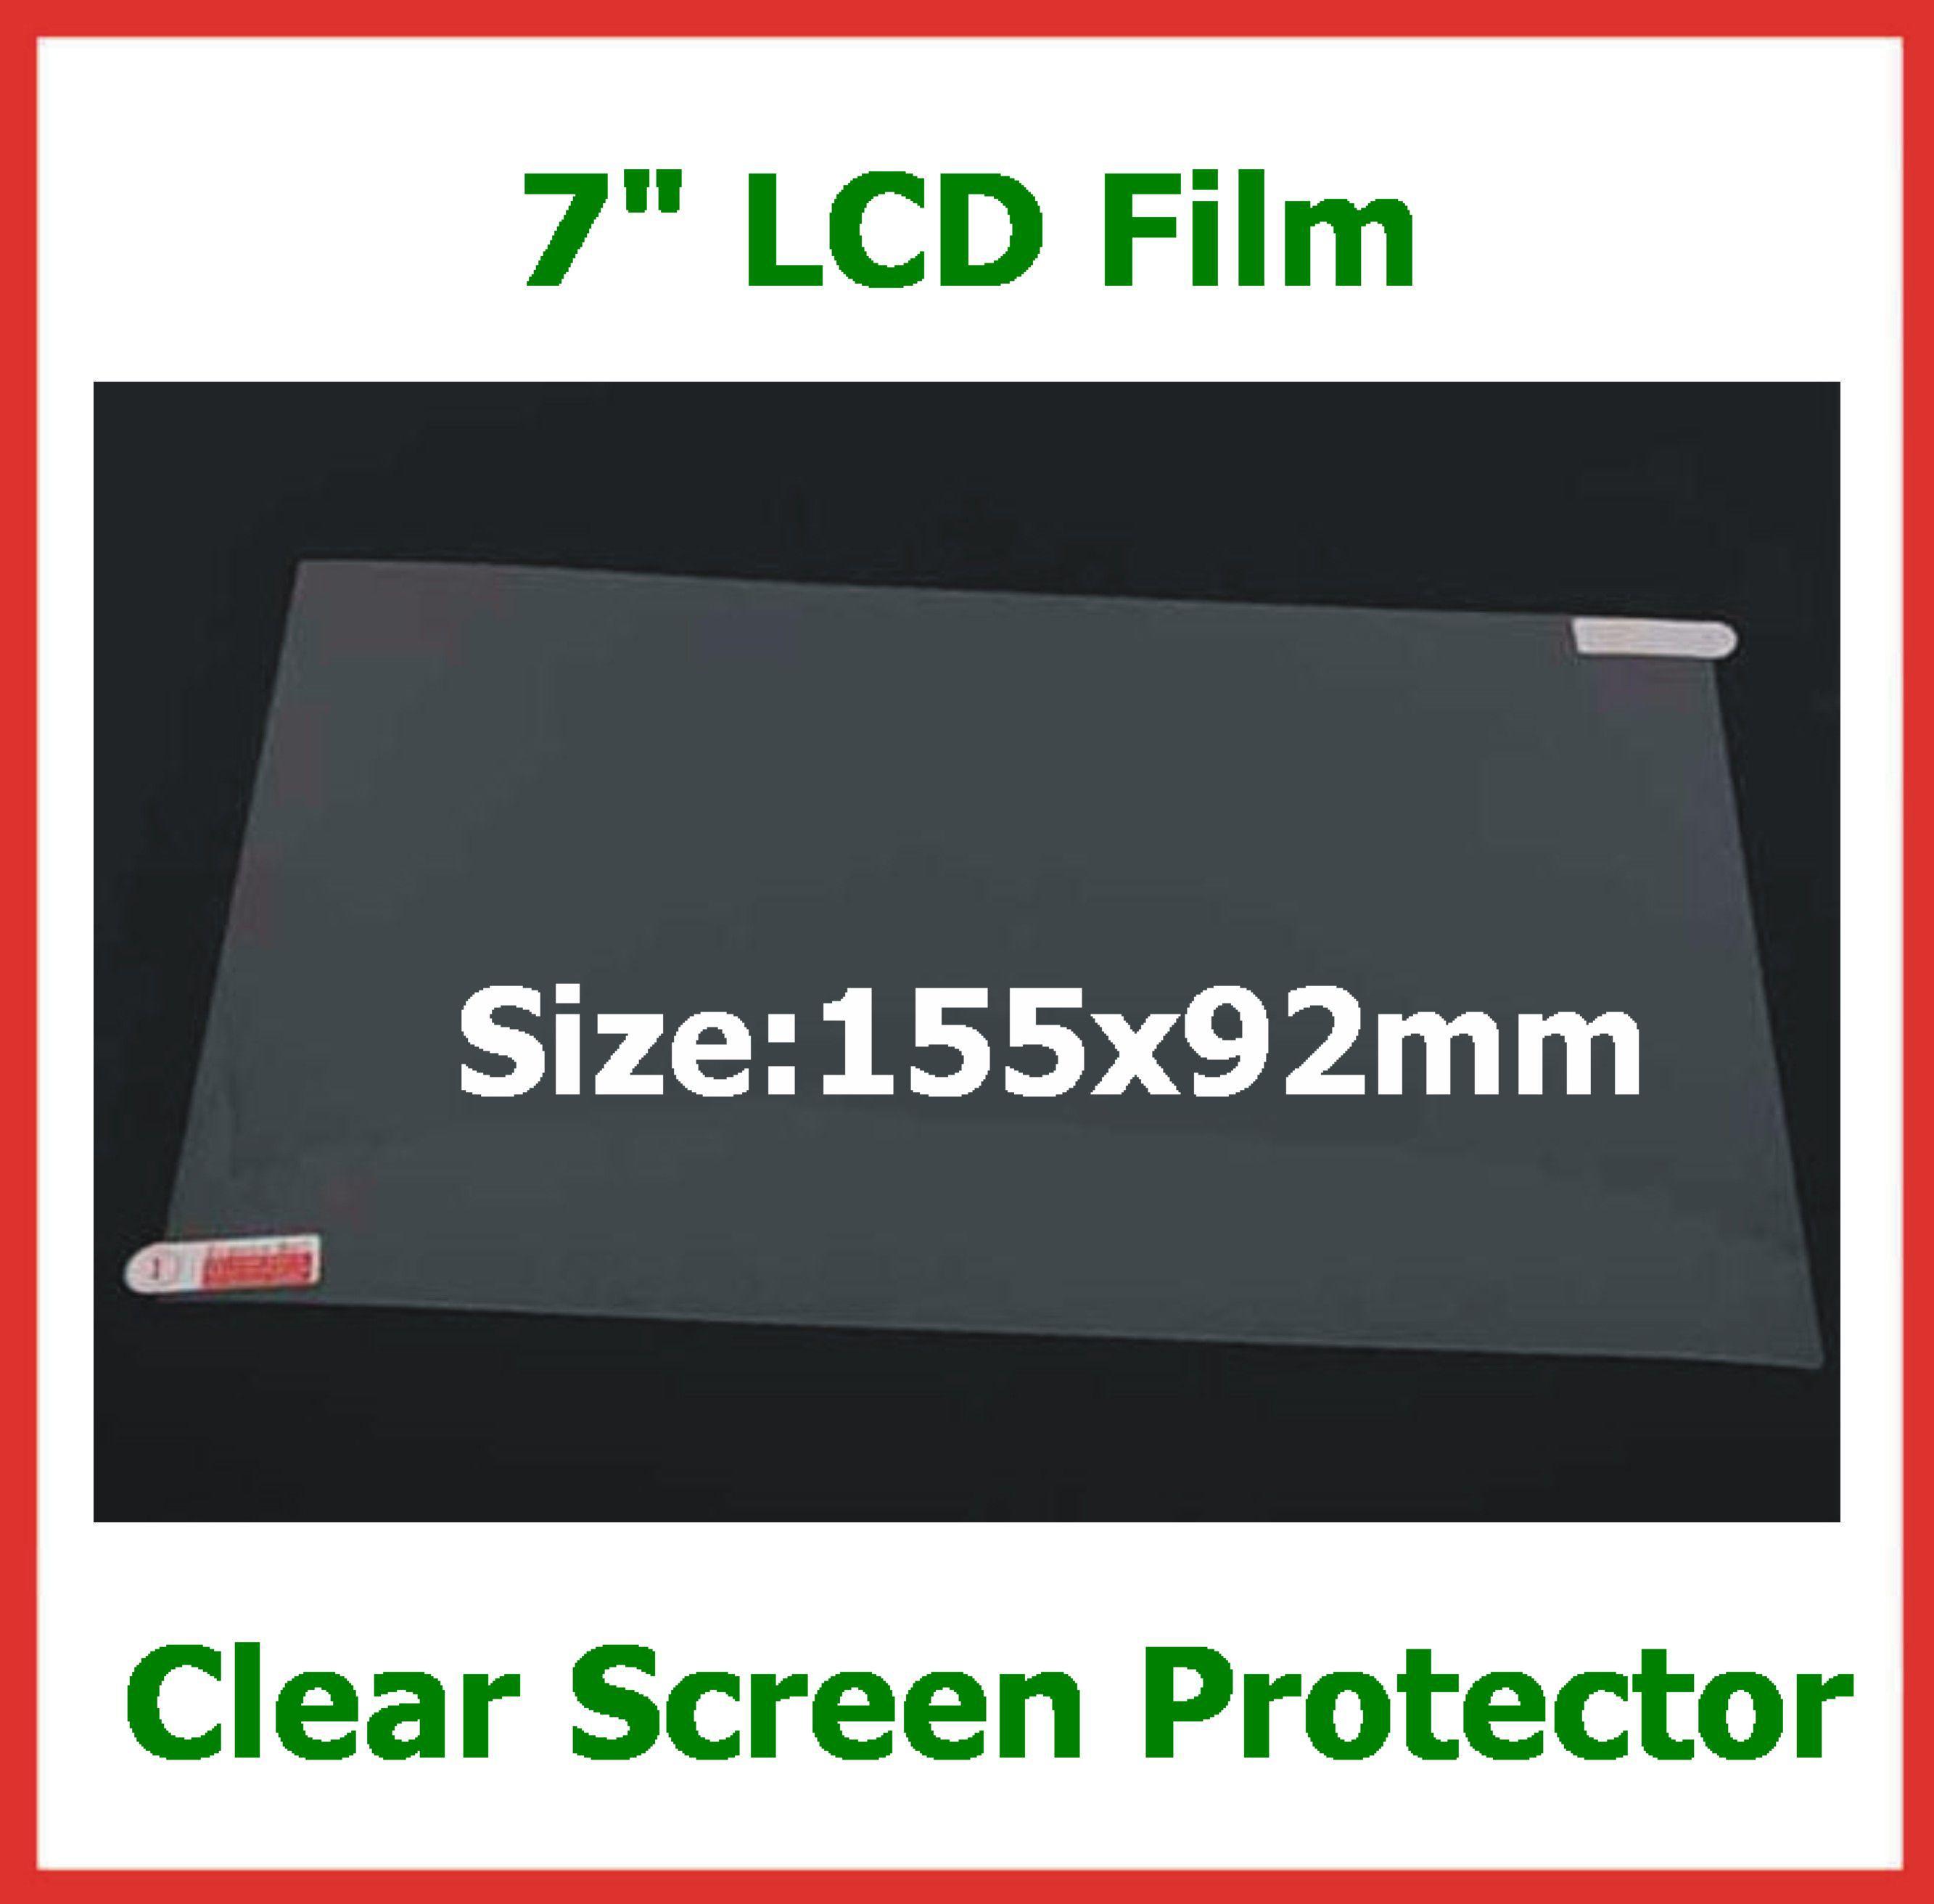 100 pcs Universal 7 polegada LCD Screen Guard Protector Film NÃO Full-Screen Tamanho 155x92mm para GPS Tablet PC câmera